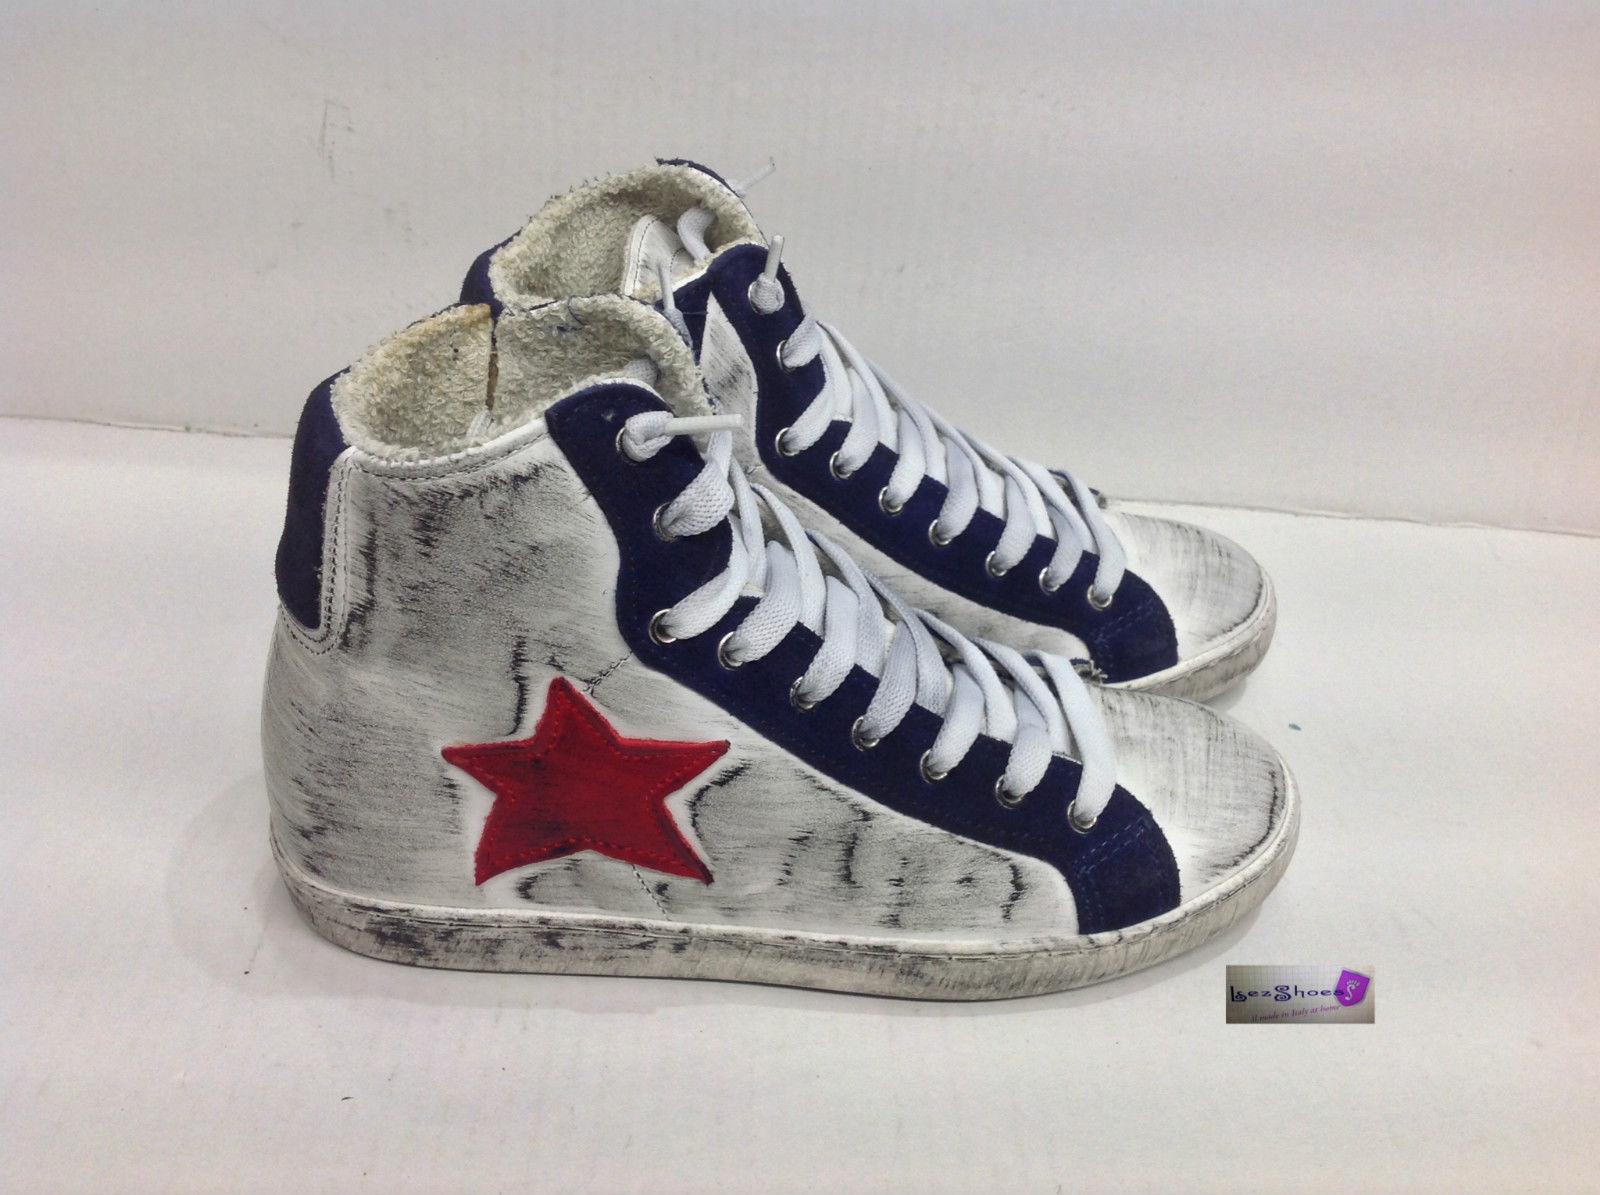 scarpe sneakers alte uomo donna pelle bianco blu stella ross  3785fa2bd8b